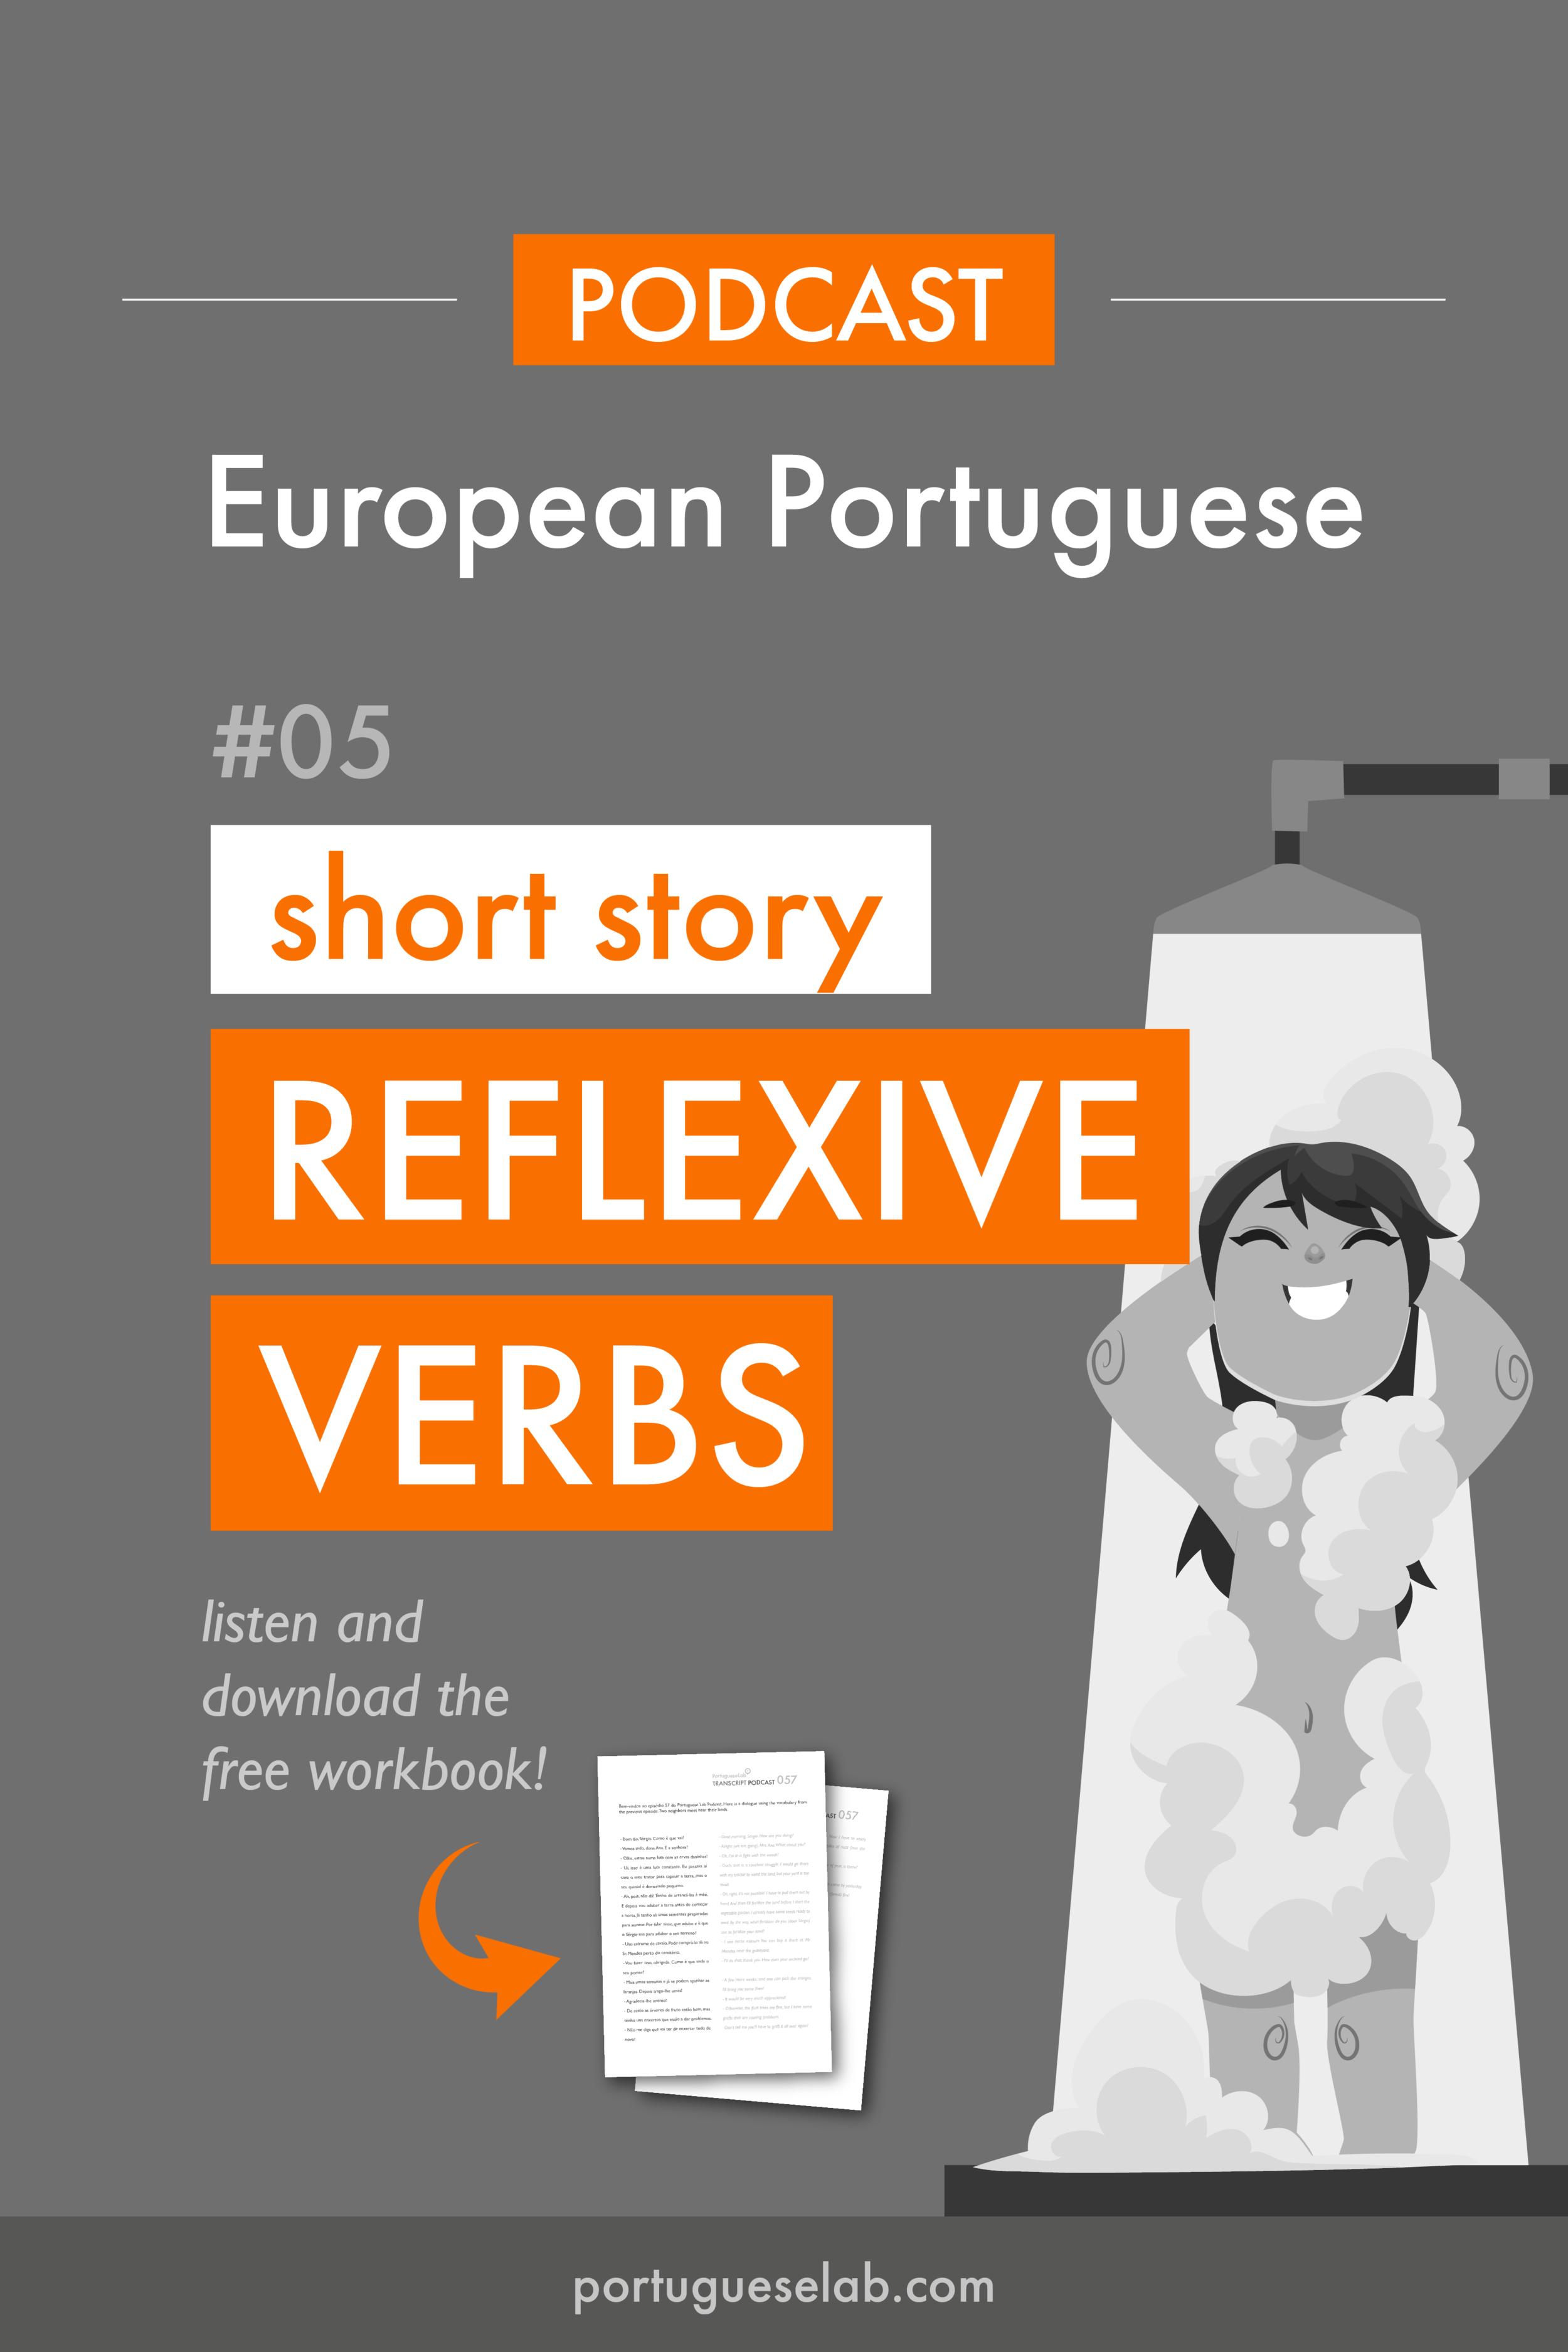 Portuguese Lab Podcast - European Portuguese - 05 - Short story - reflexive verbs.png